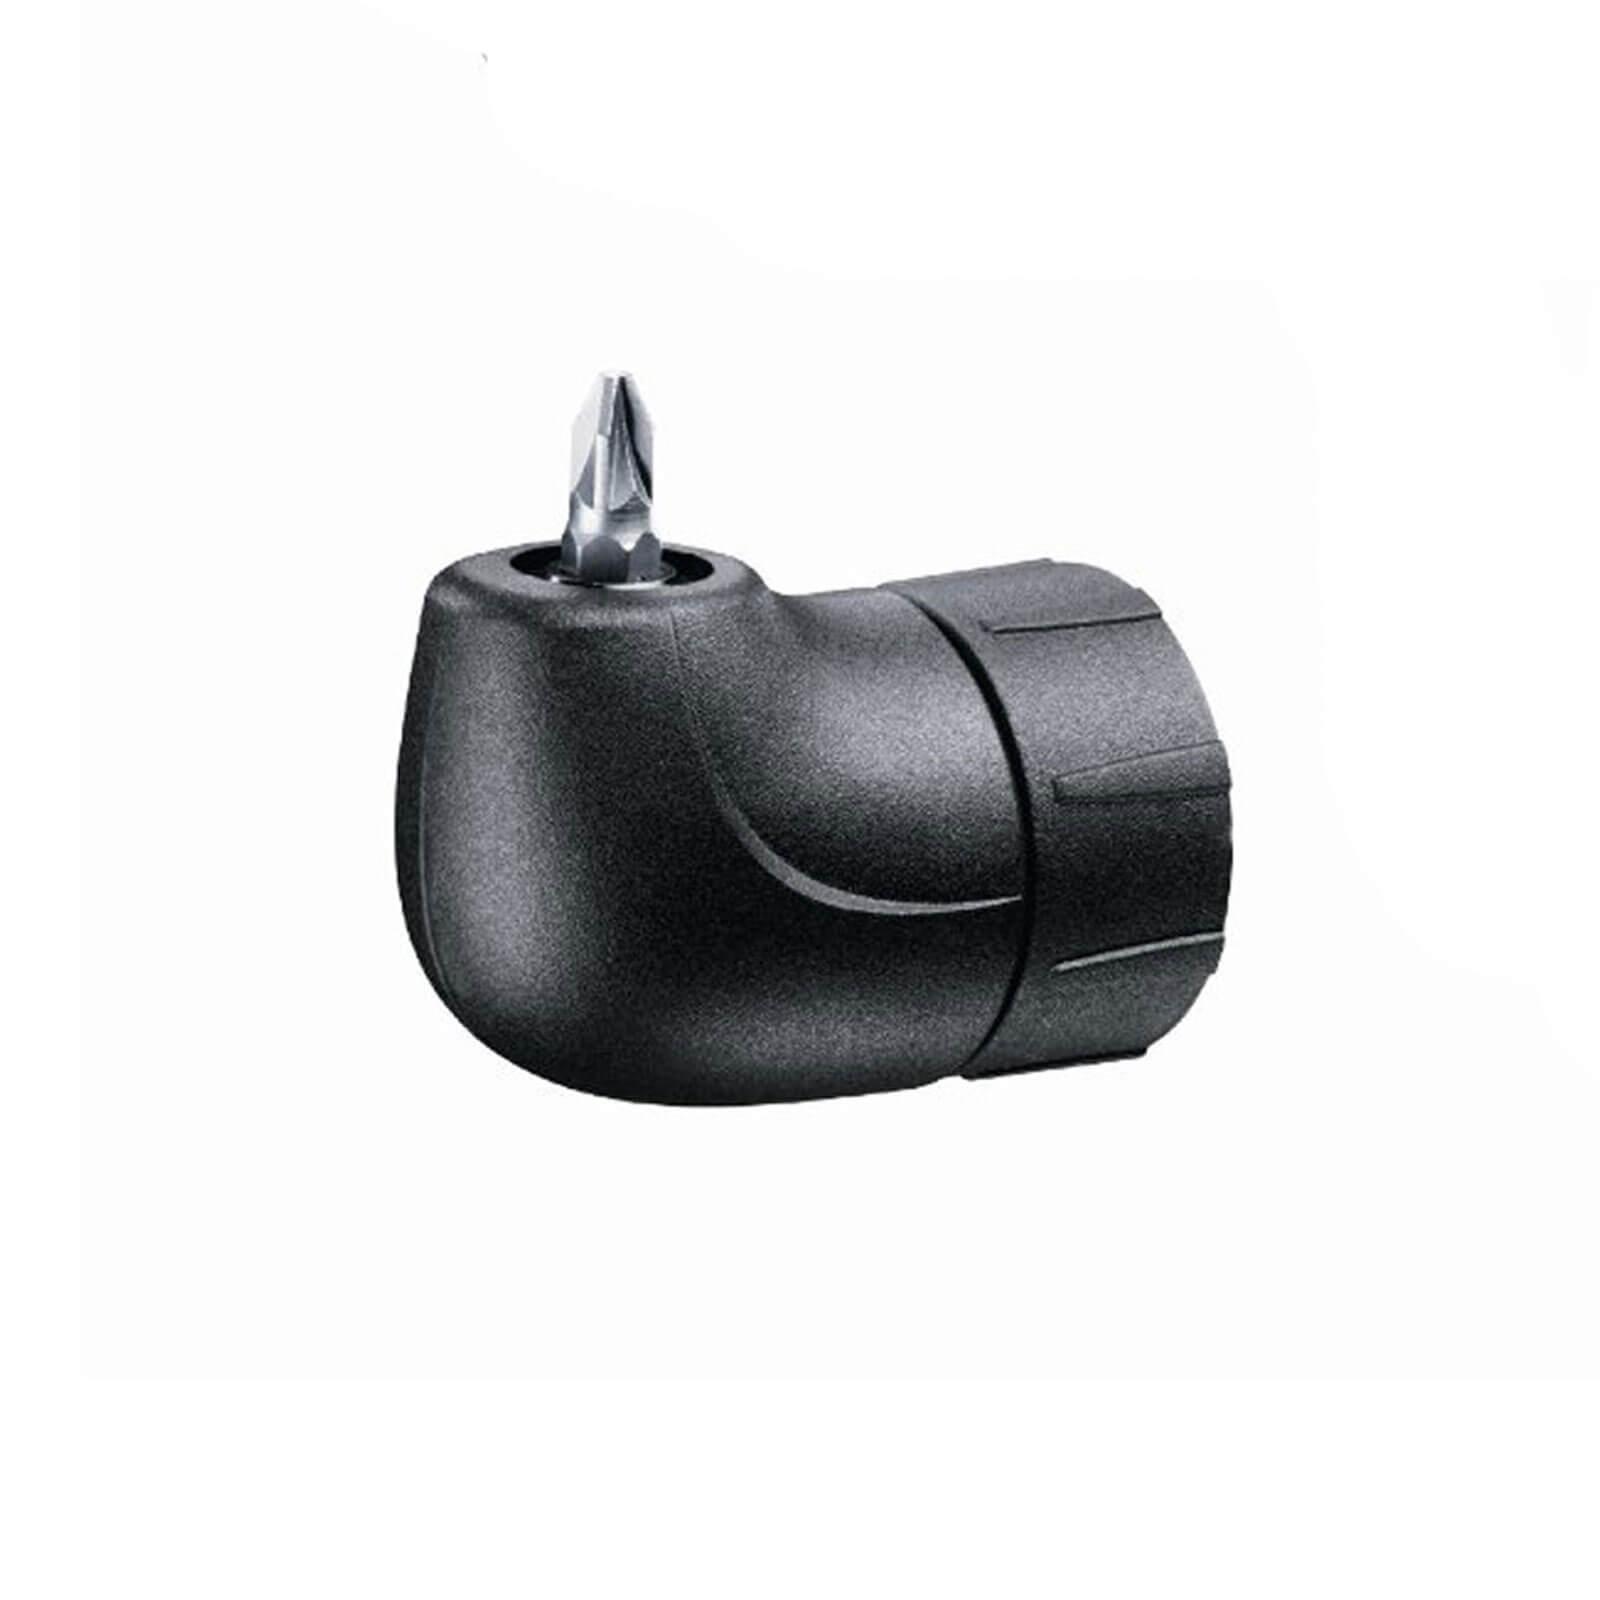 Image of Bosch Angle Adaptor for IXO Screwdrivers